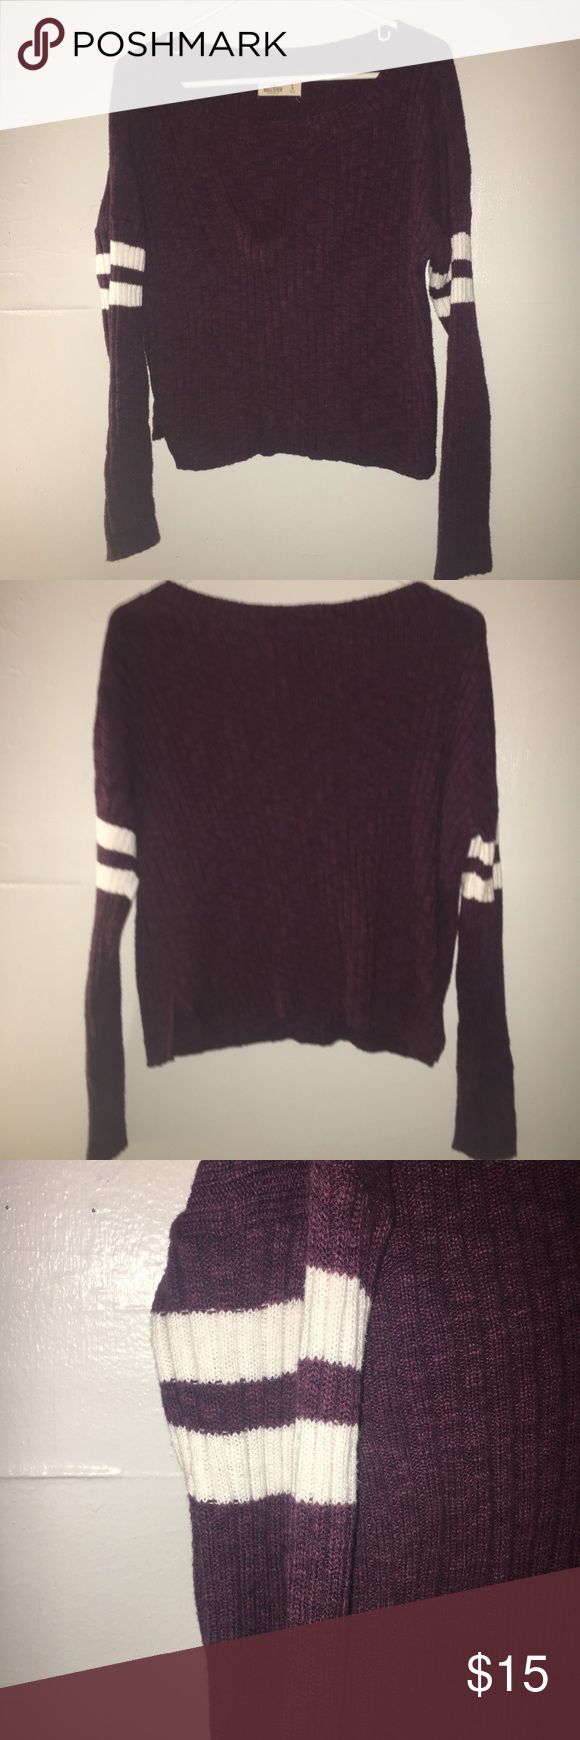 Hollister Maroon/Burgundy StrIped Crop Sweater | Customer support